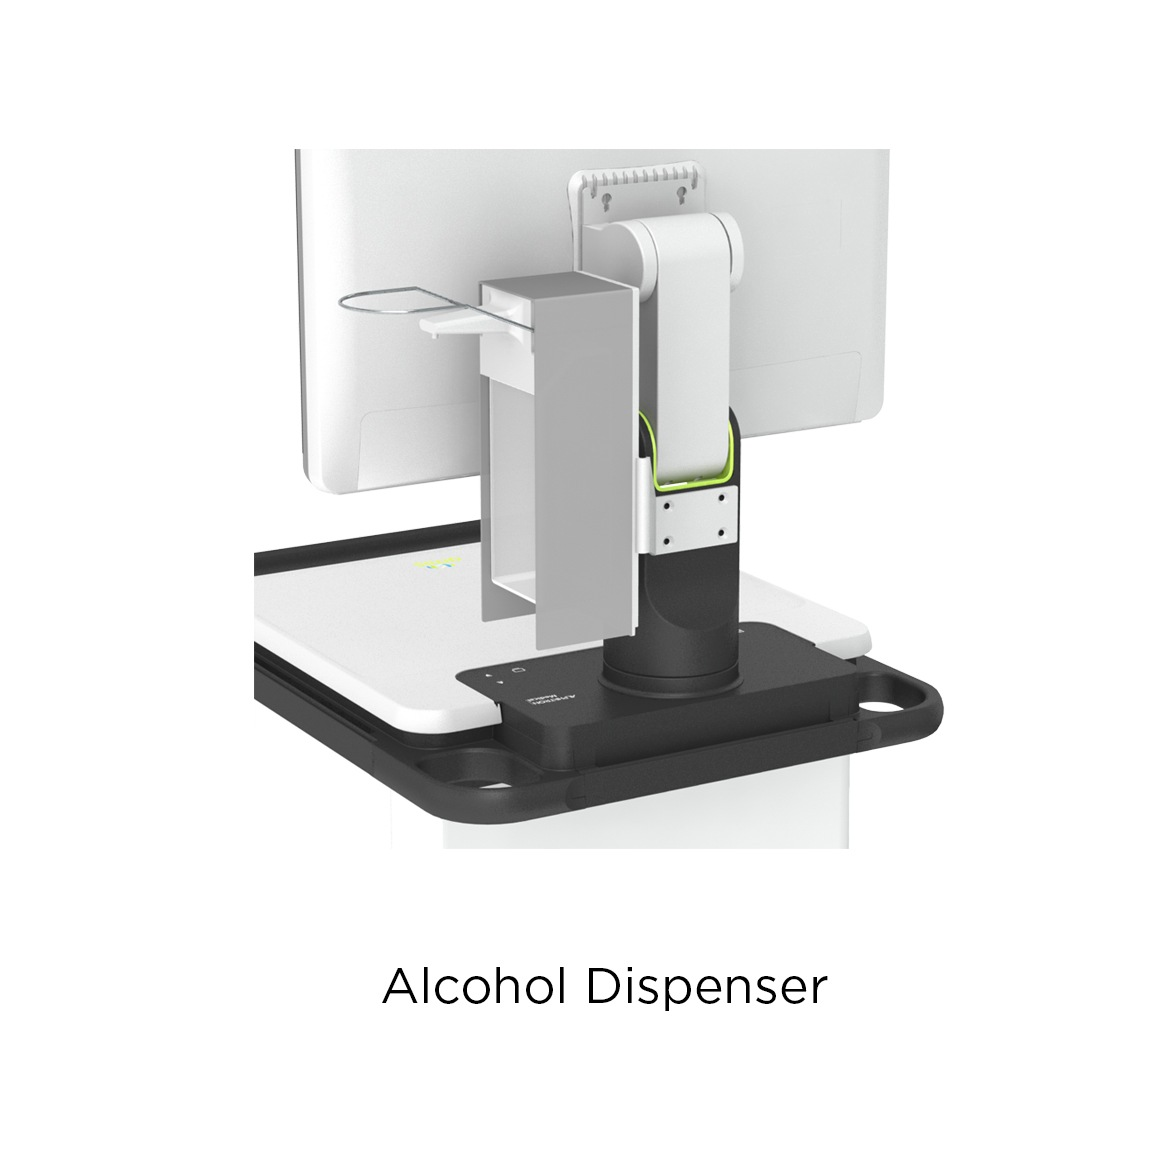 Alcohol Dispenser